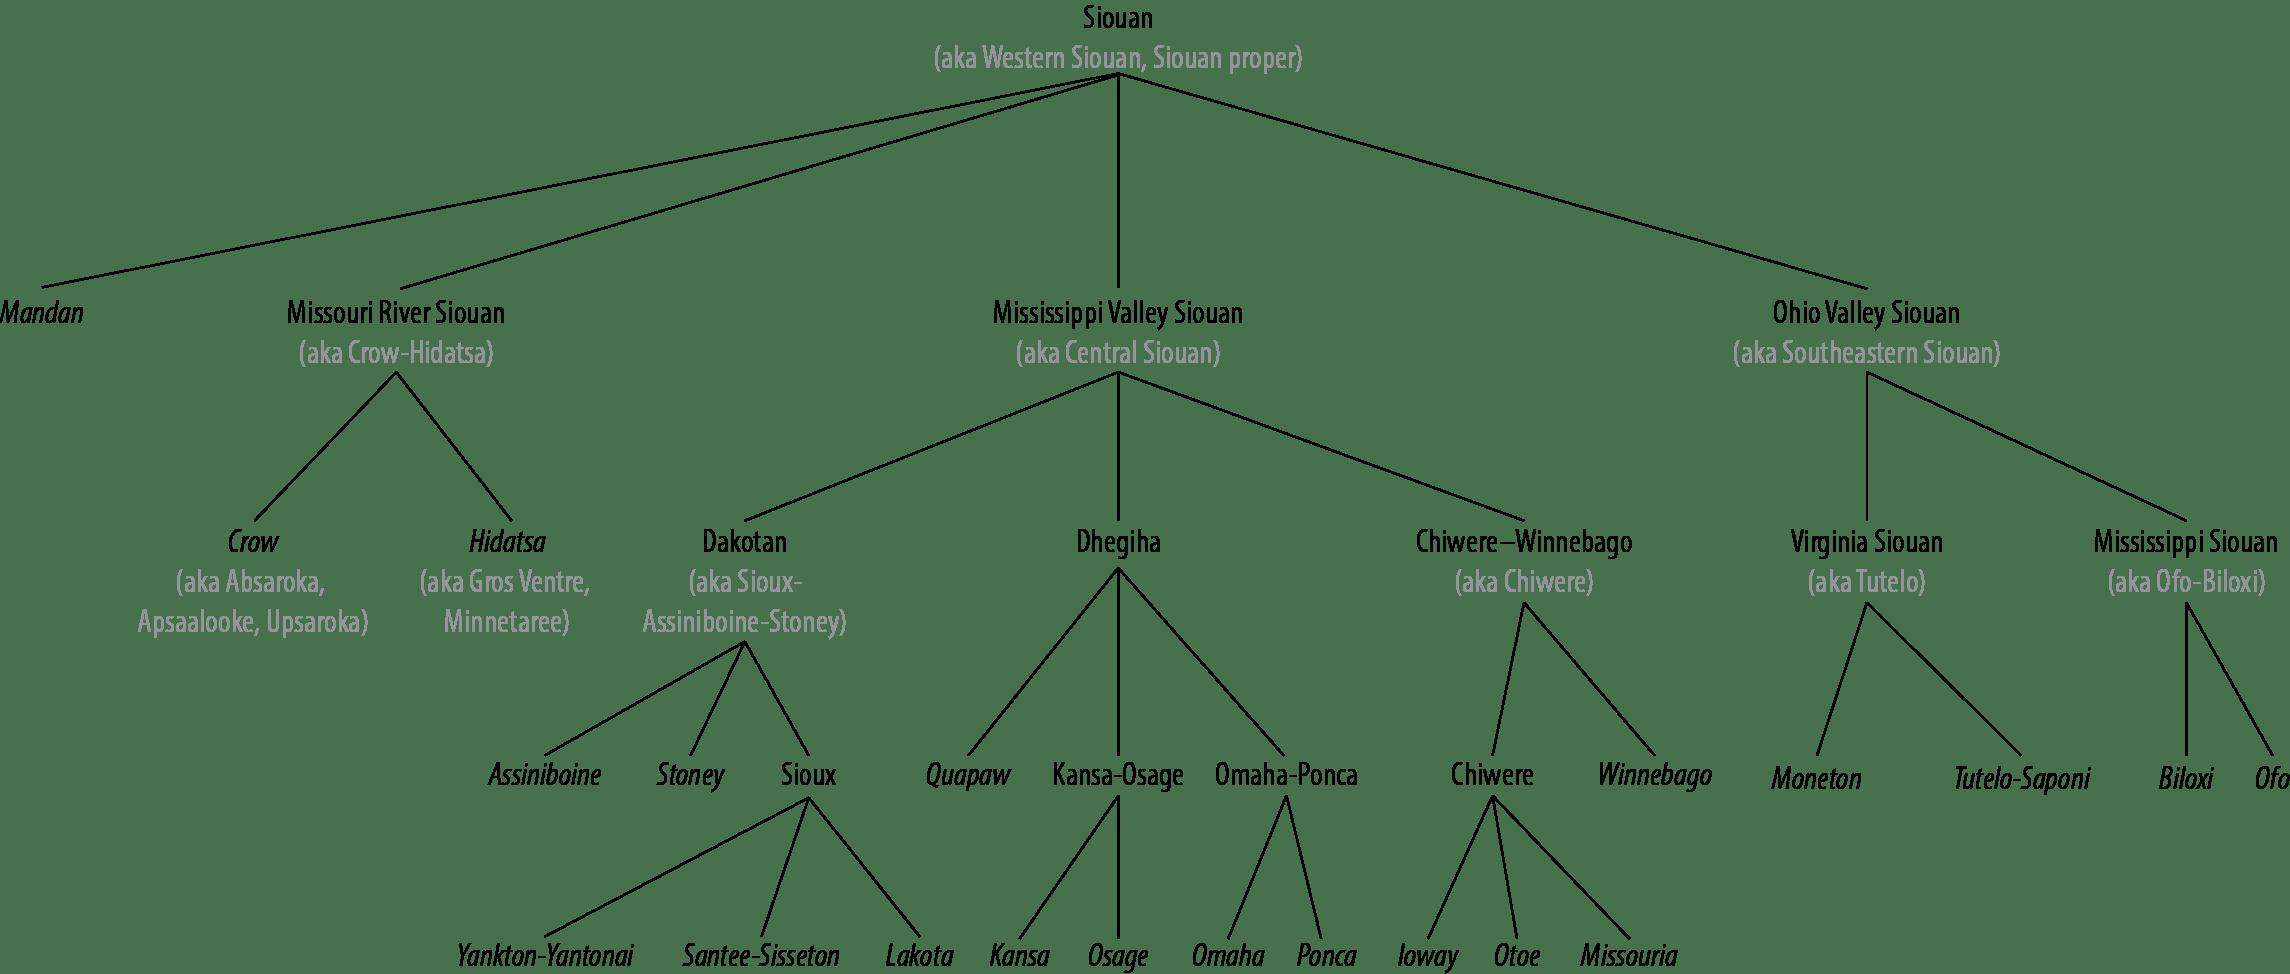 Siouan Language Family Tree